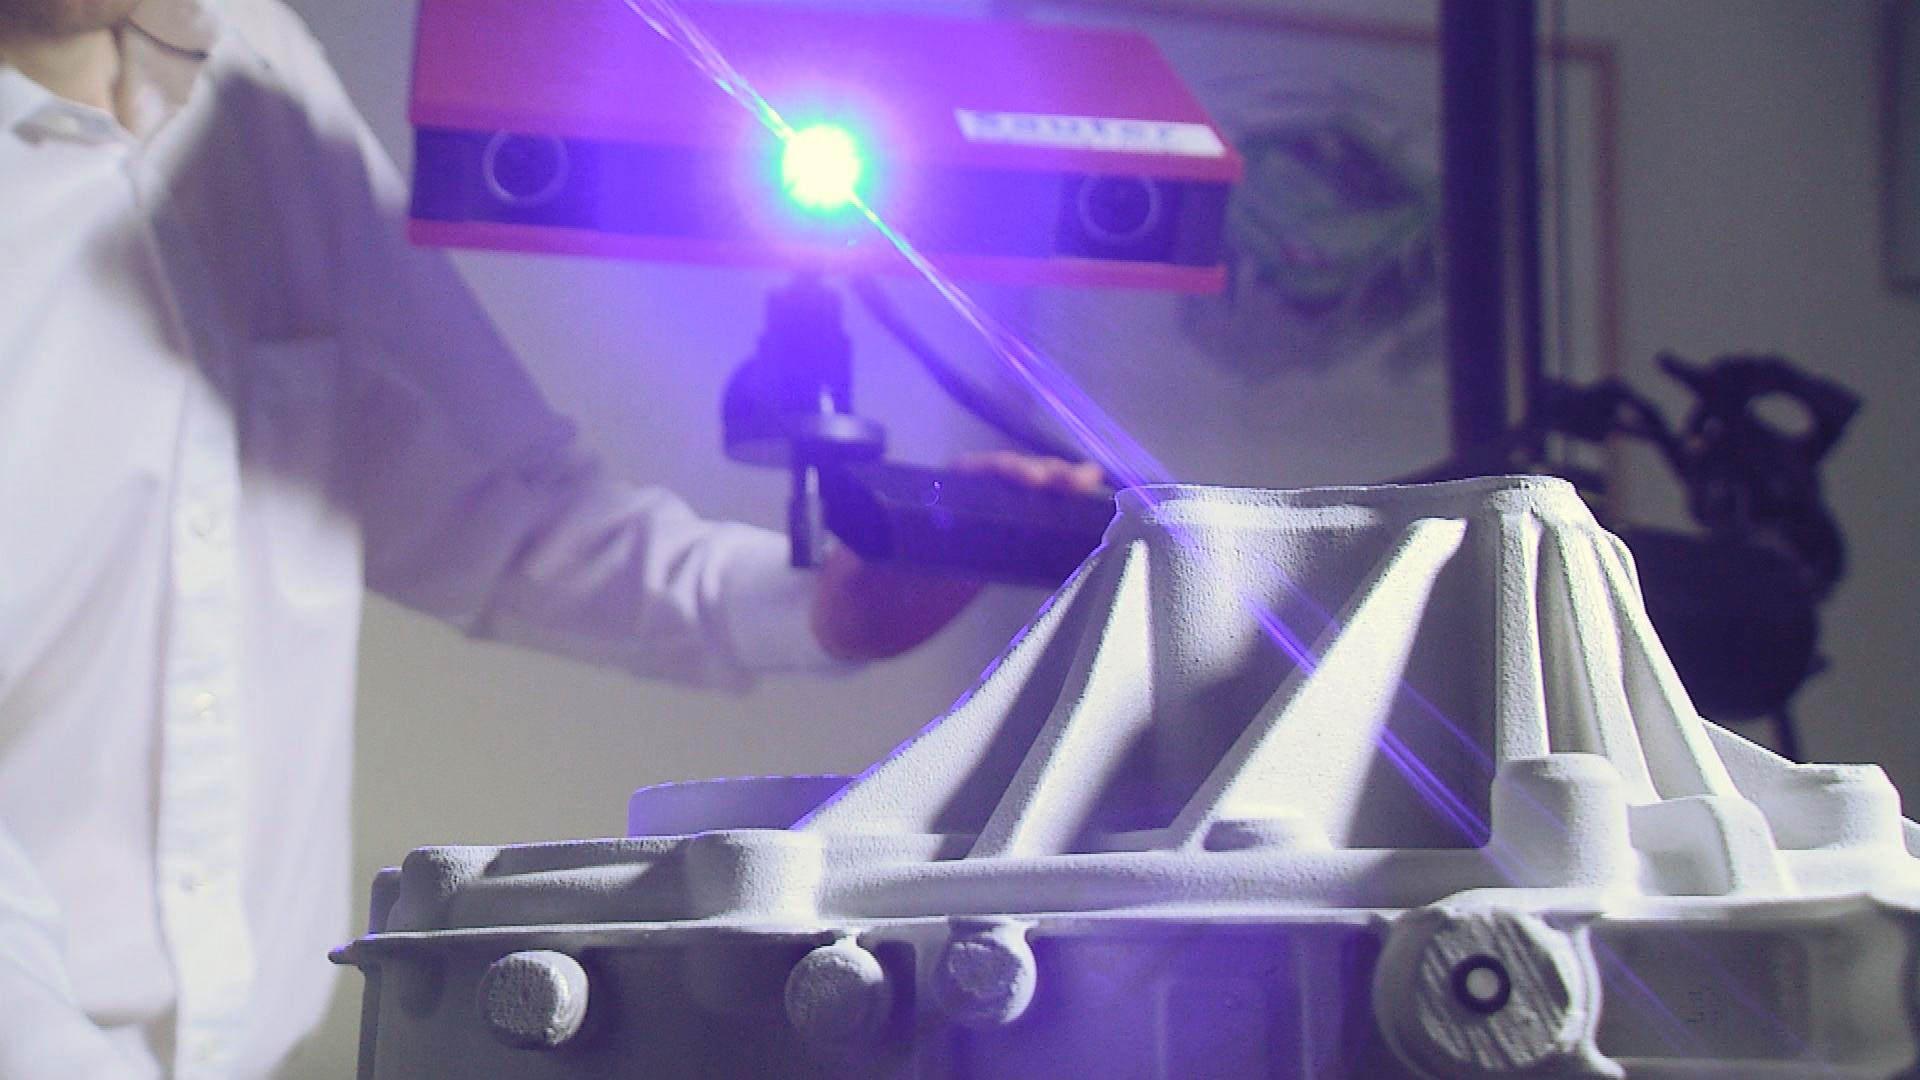 Sauter_Engineering+Design_Industrielle_Messtechnik-3D_Scannen-a